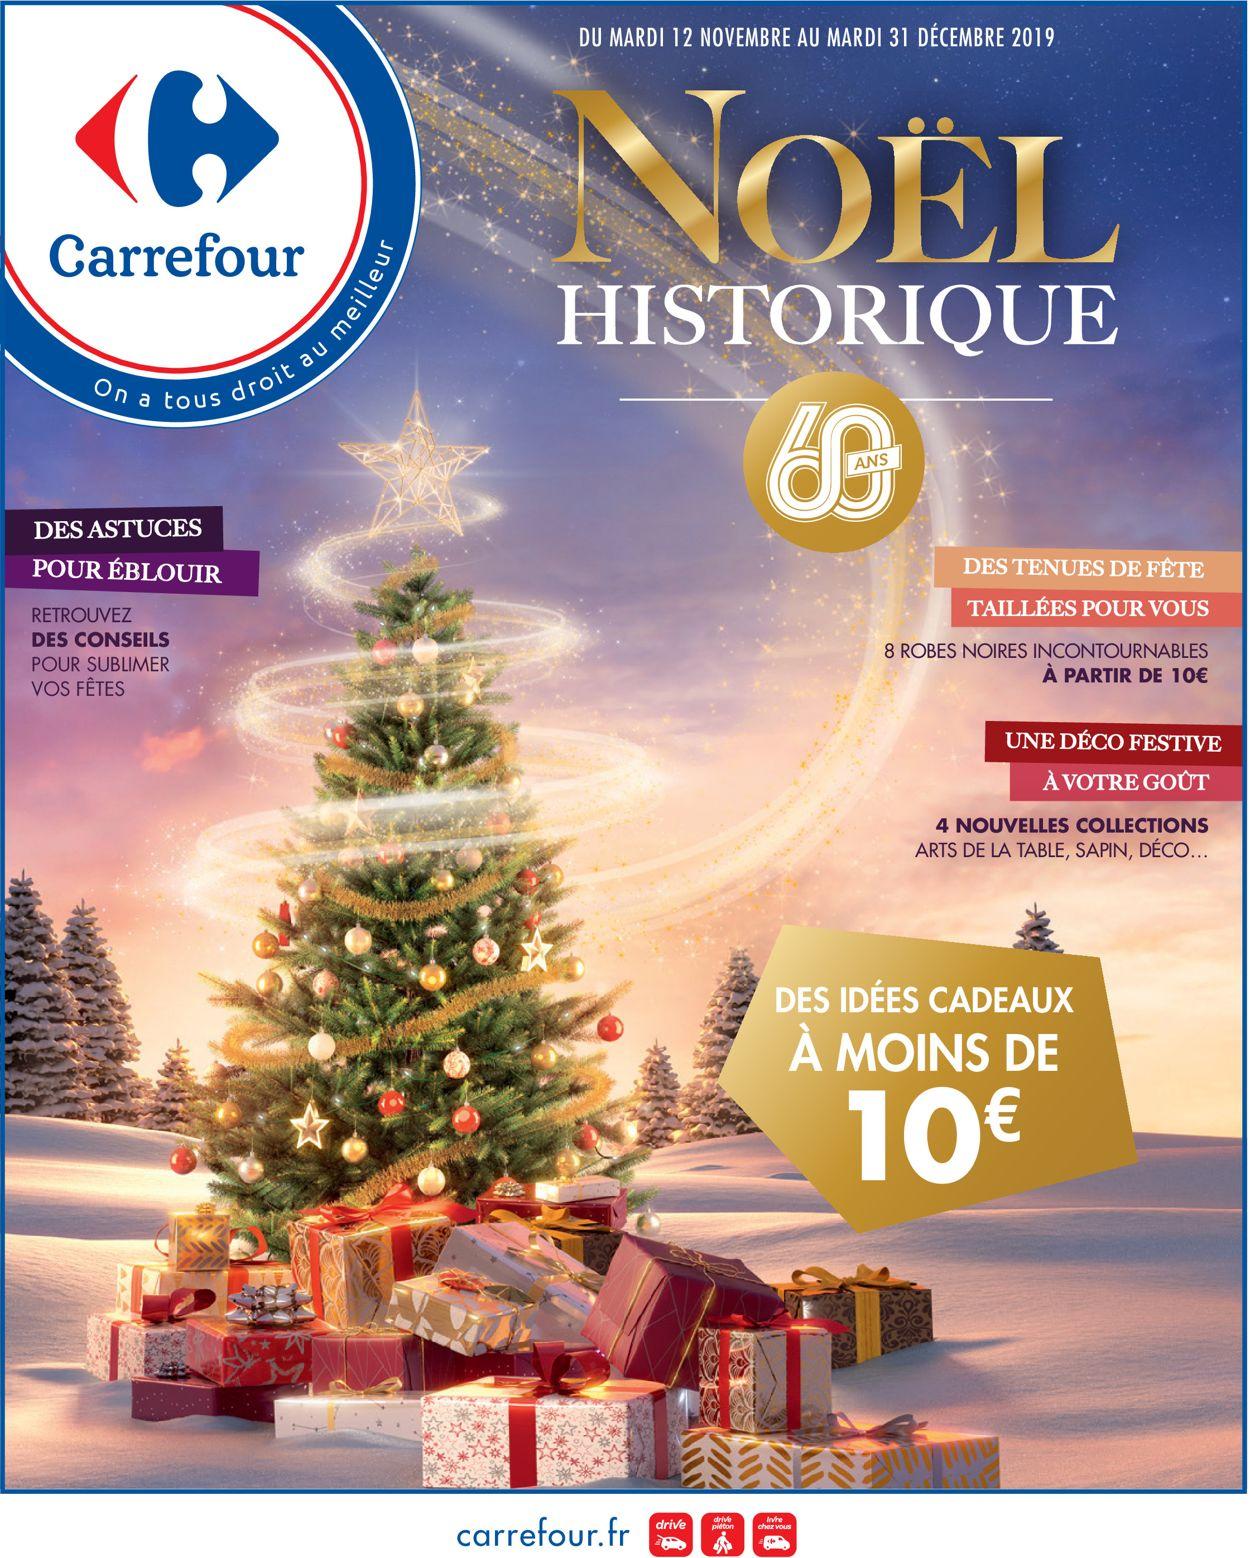 Carrefour - catalogue de Noël 2019 Catalogue - 12.11-31.12.2019